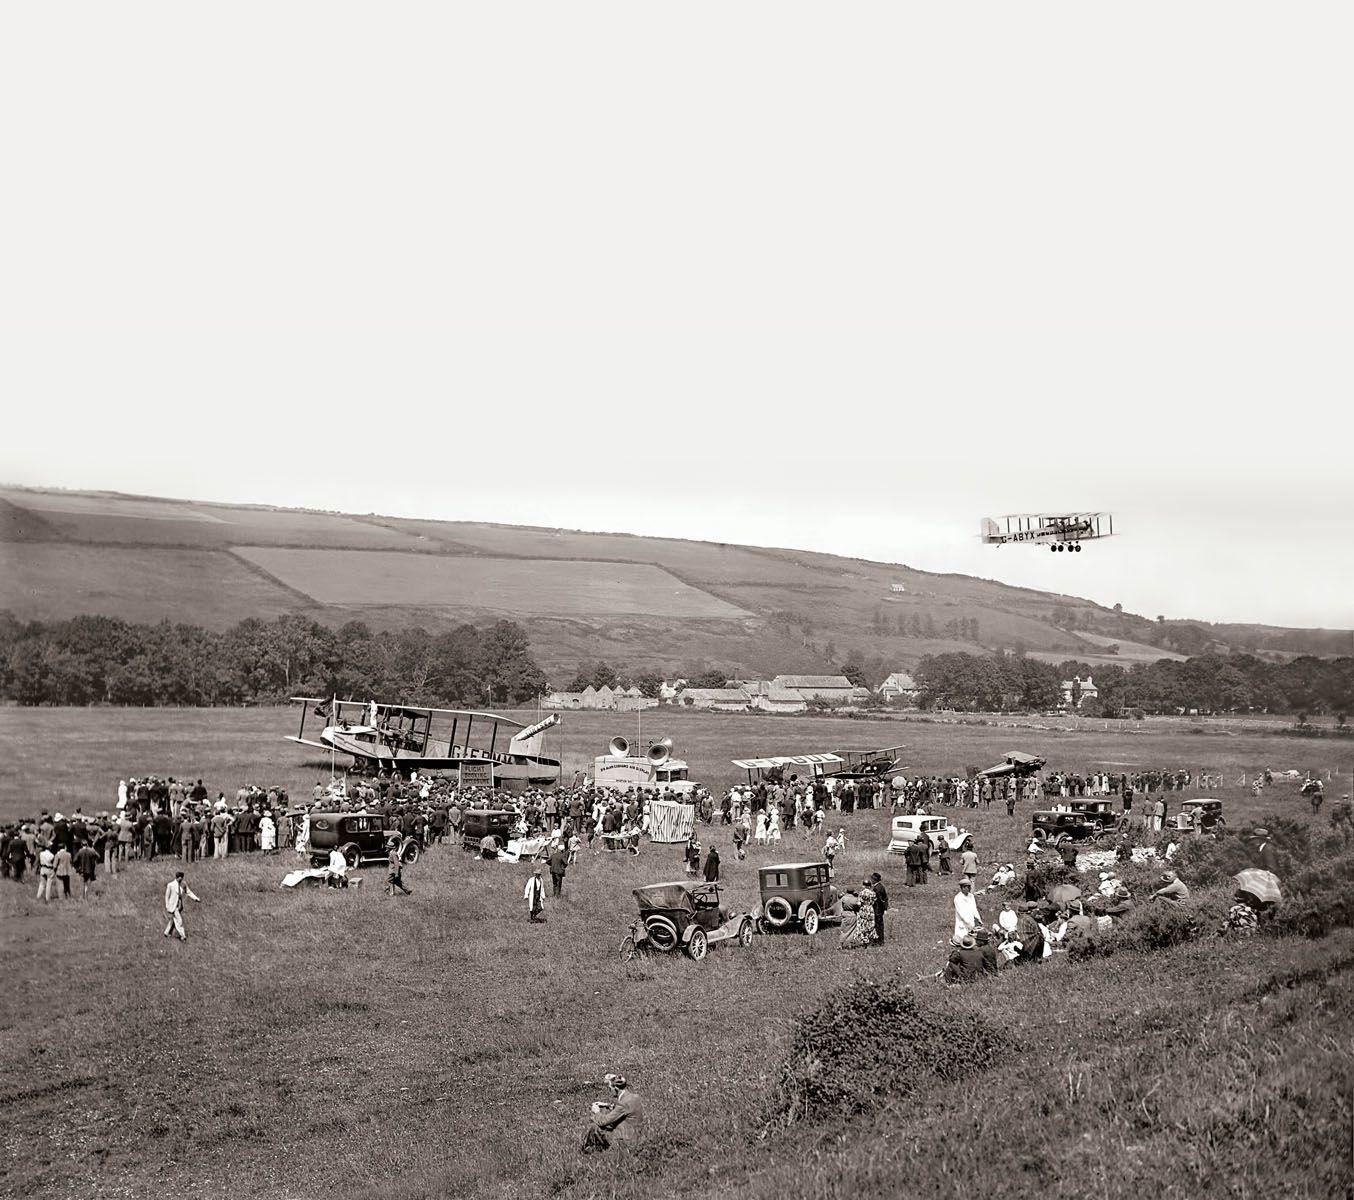 The Photograph Shows The Cobham Air Circus At Ballincollig